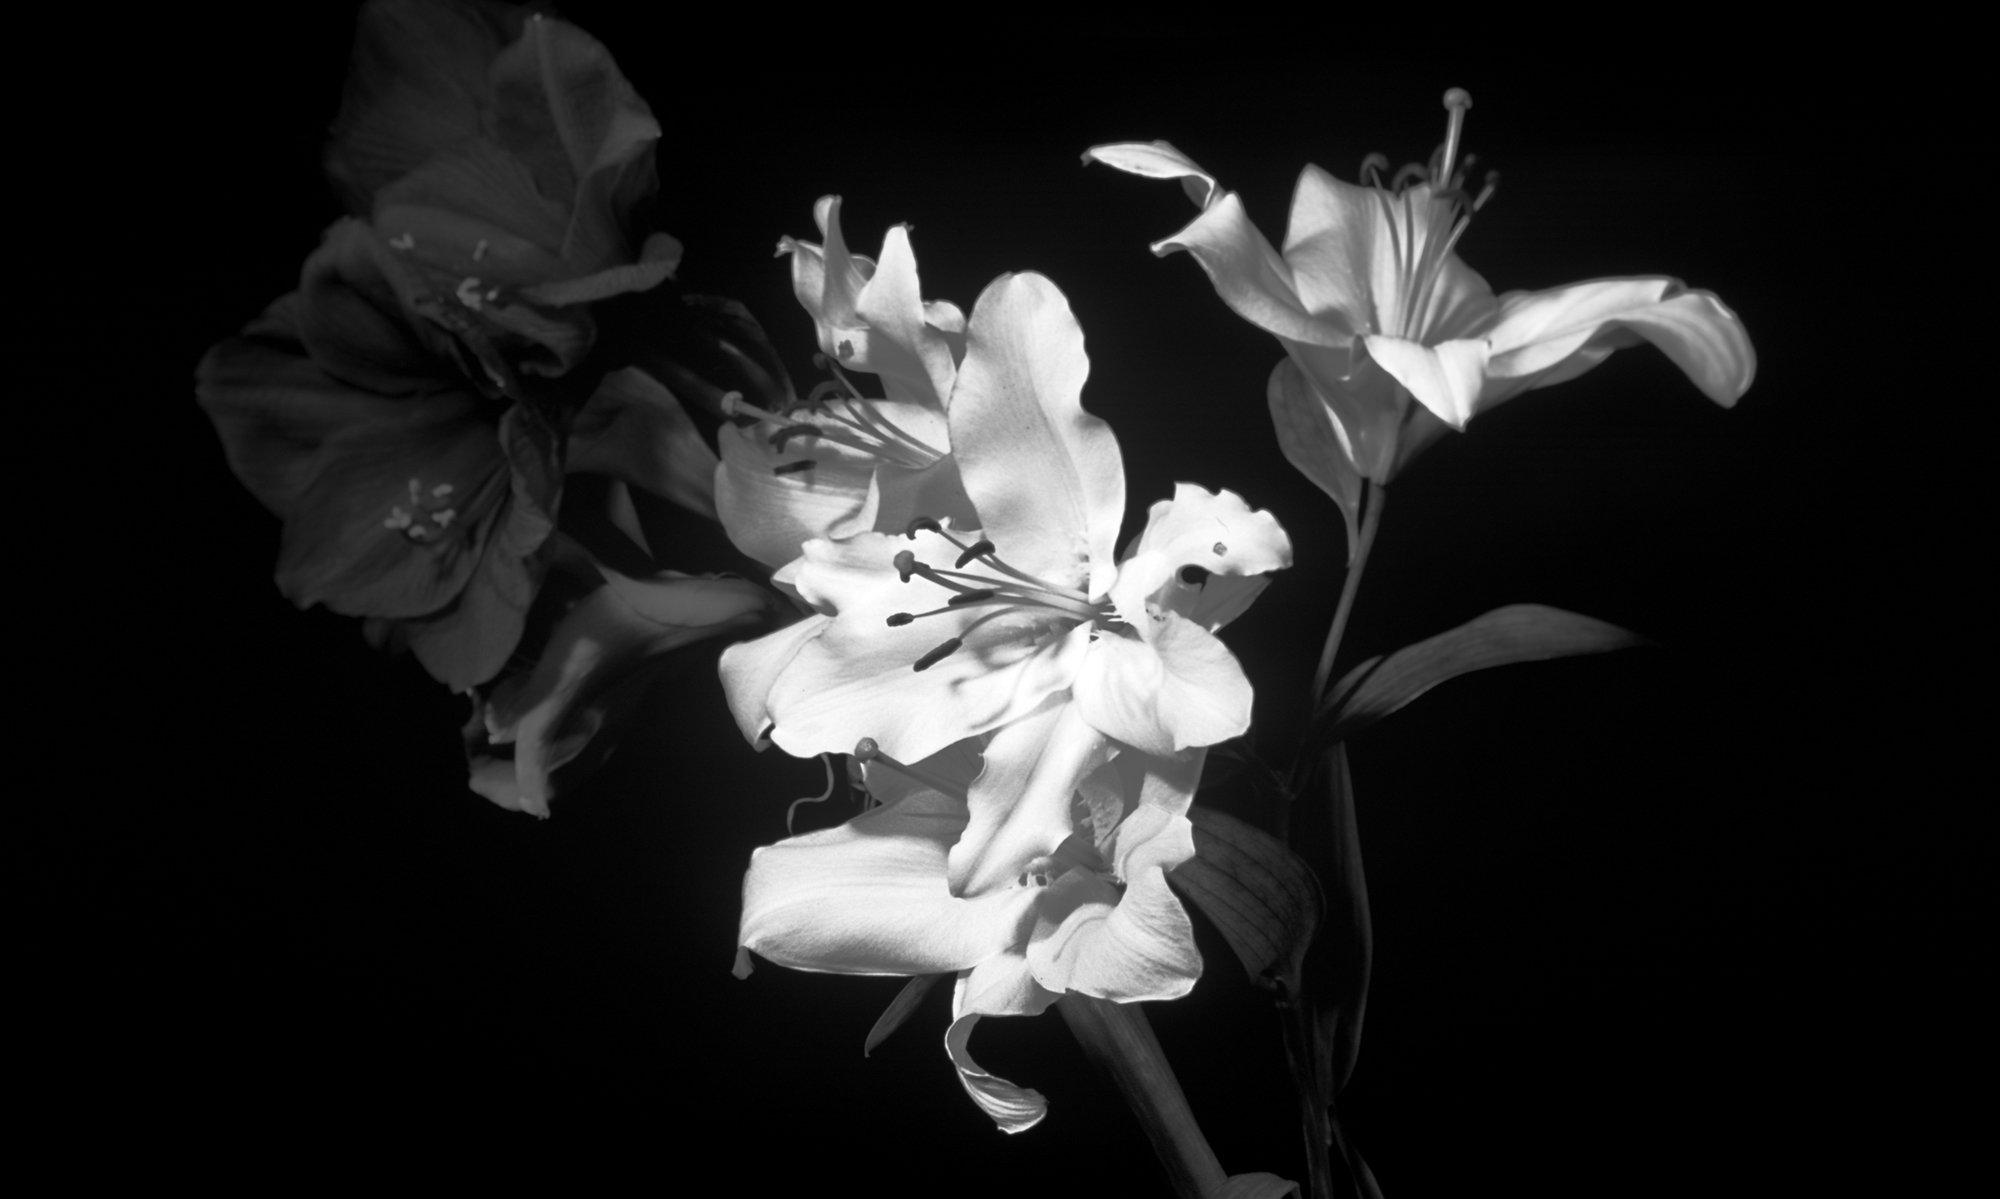 картинка с цветком на черном фоне то